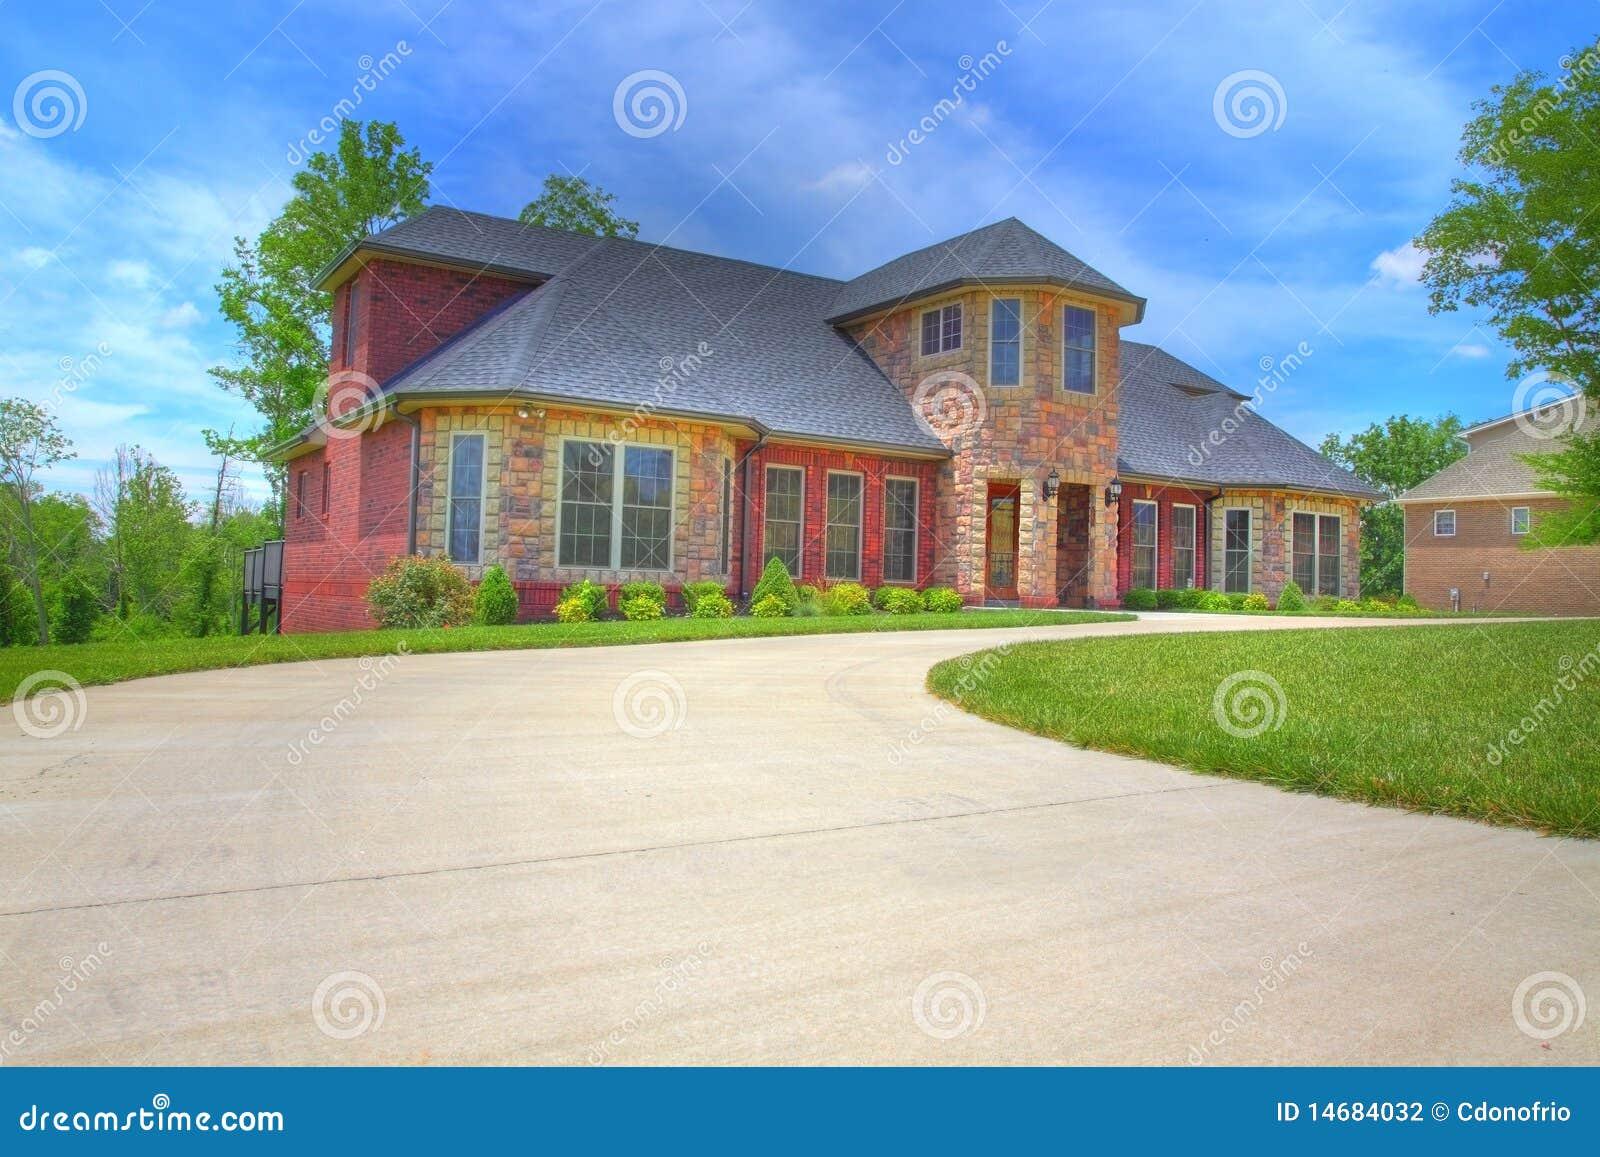 Large Suburban House Stock Photo Image Of Neighborhood